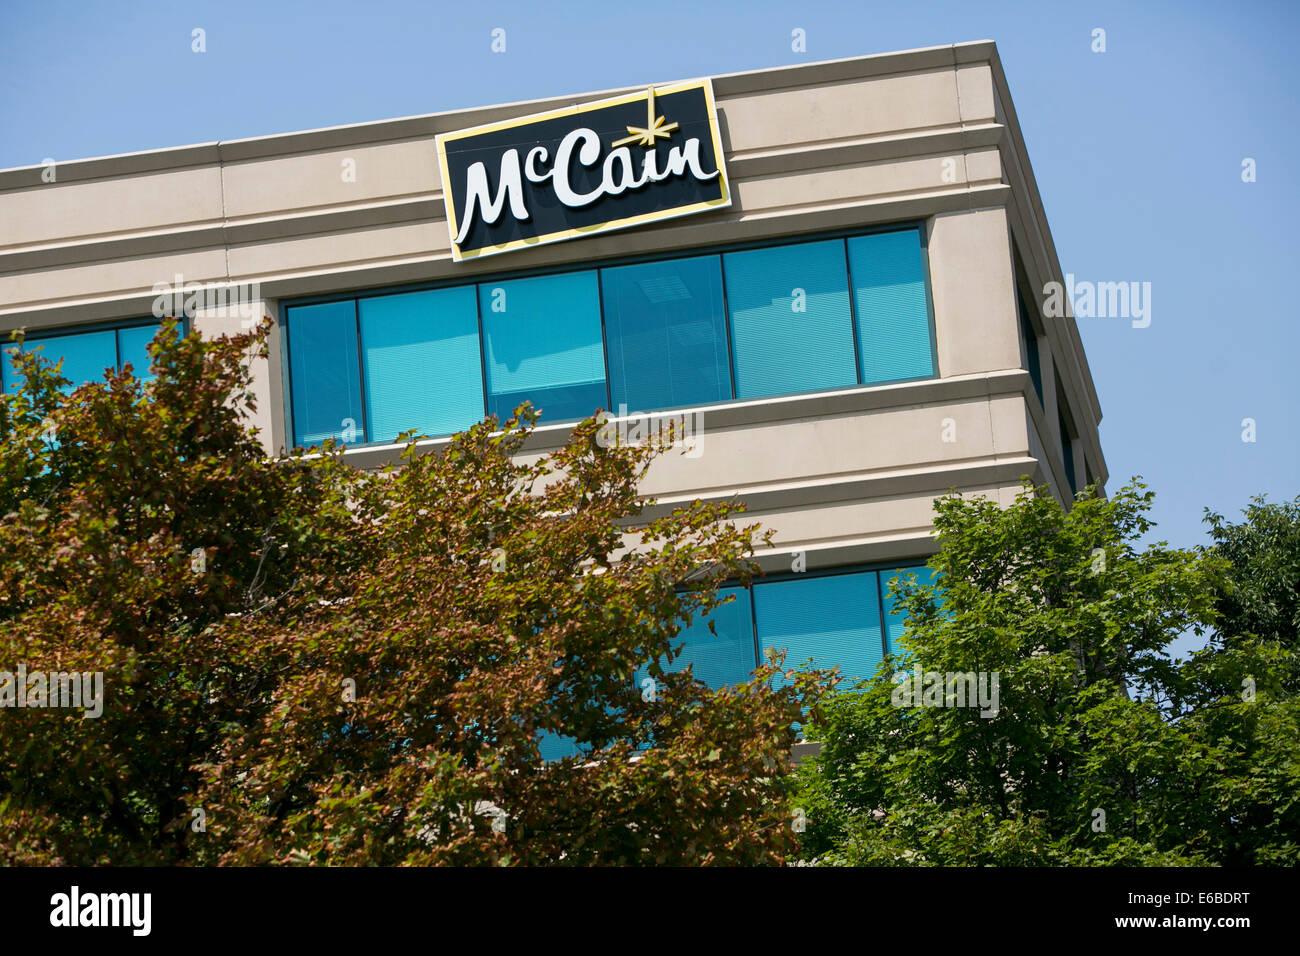 The headquarters of McCain Foods USA in Lisle, Illinois